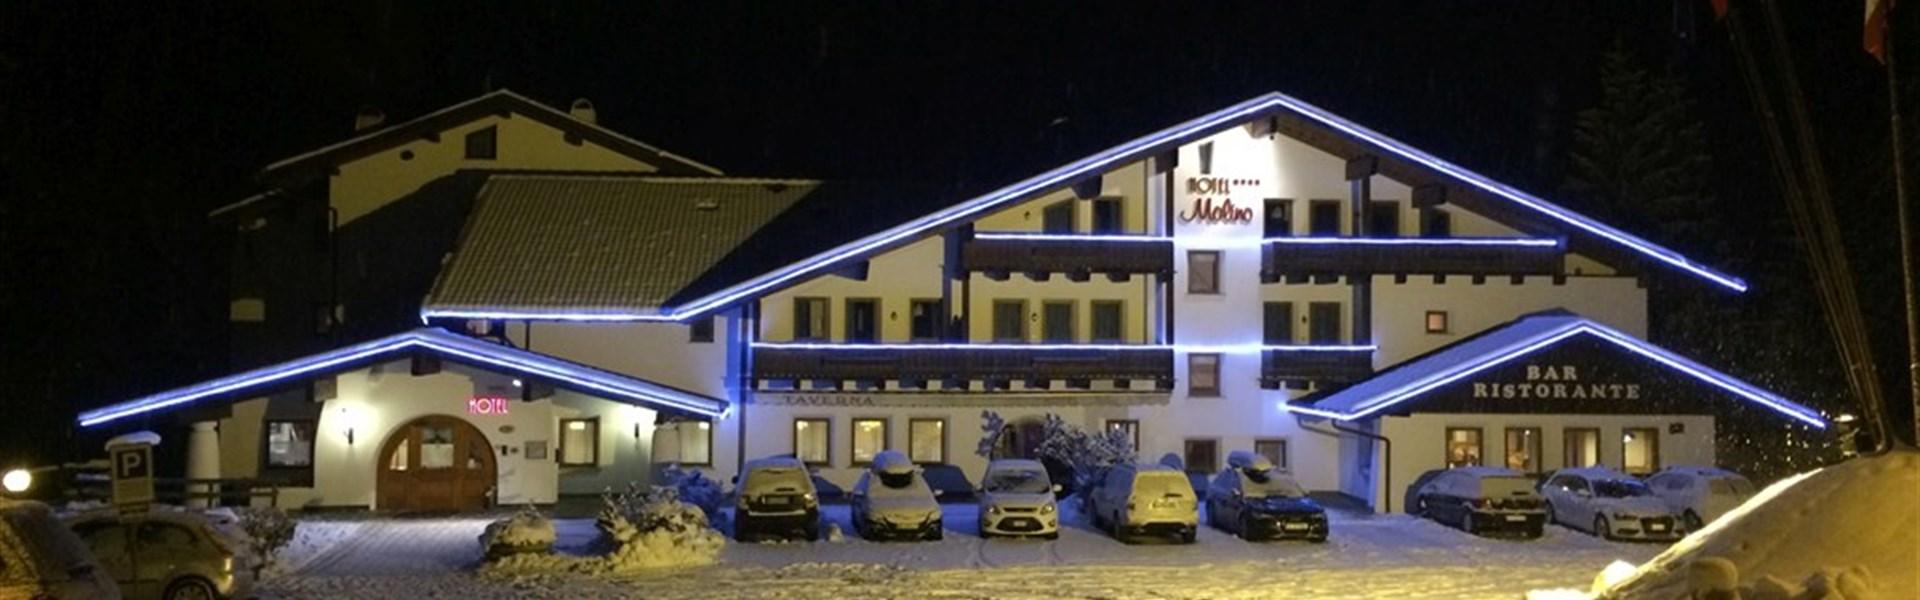 Hotel Molino -